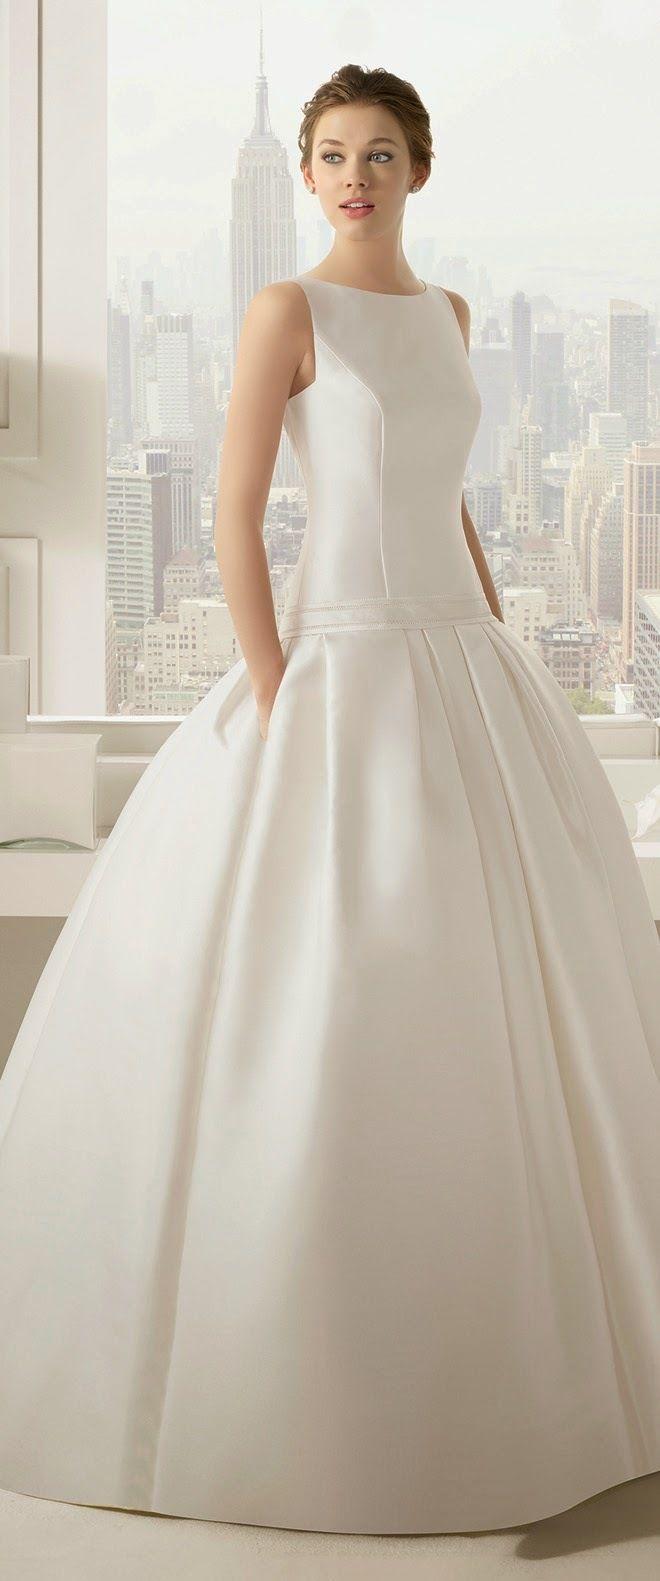 Vera Wang Wedding Dresses 2015  Weddings  Wedding gowns Wedding dresses Elegant wedding dress